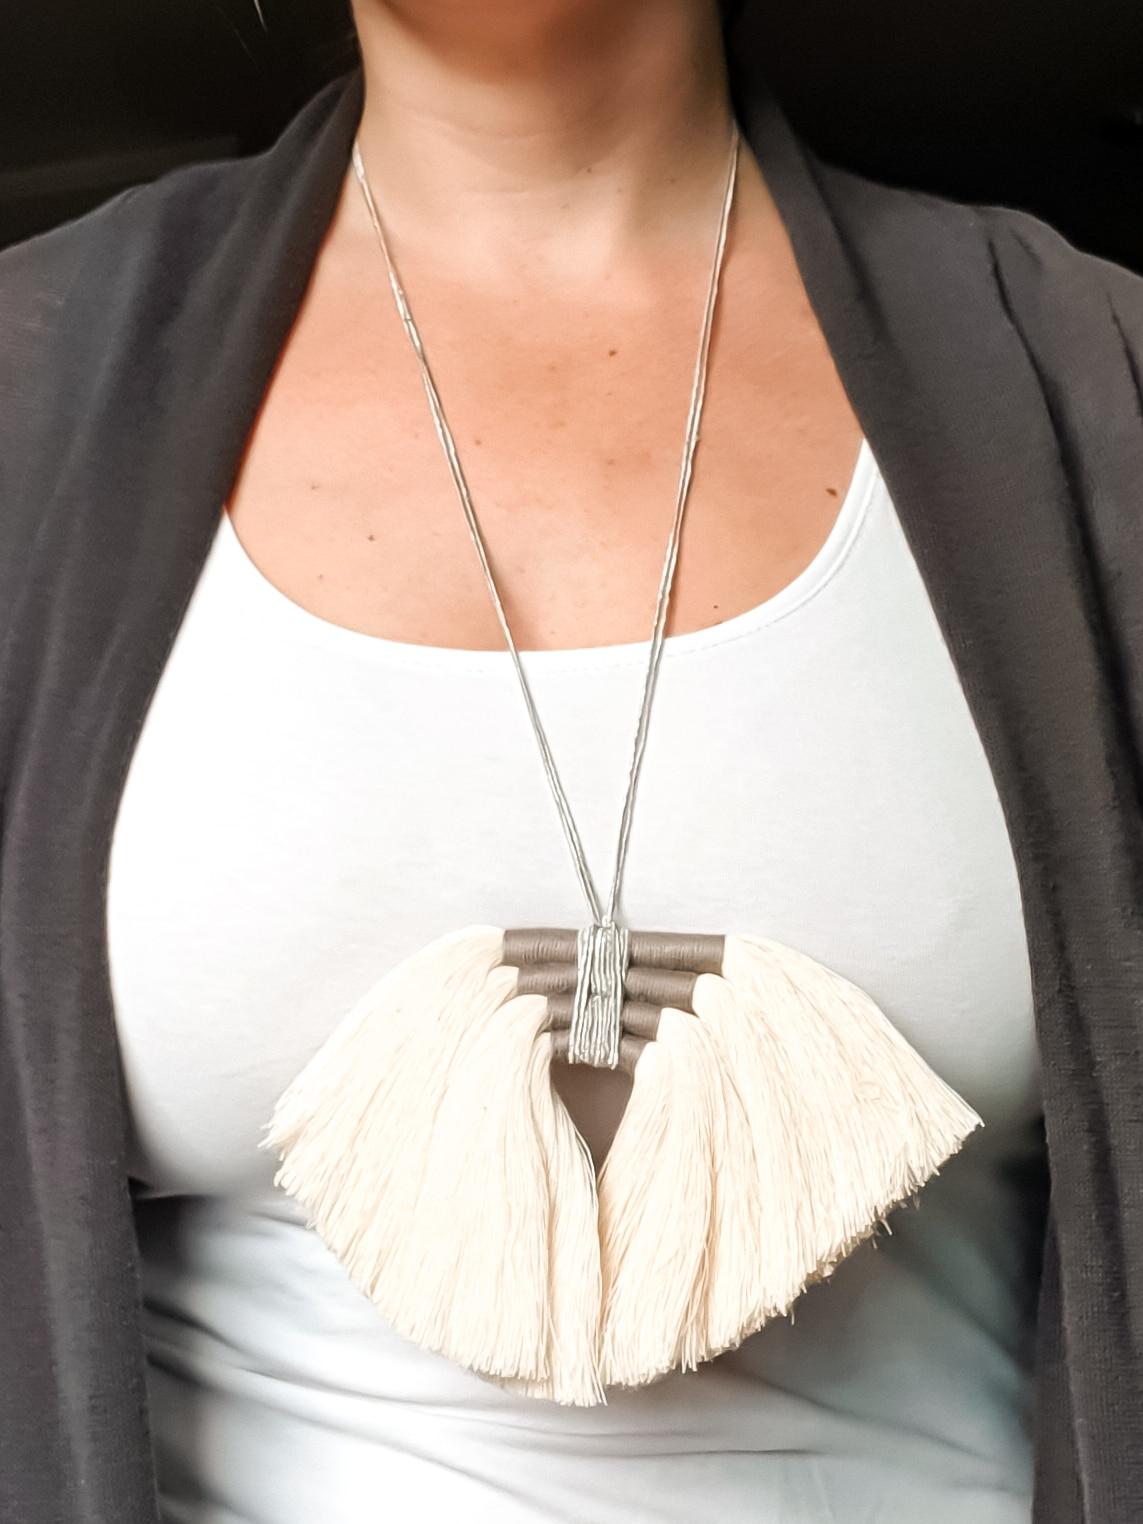 Organic Macrame Necklace by Amun Handmade Designs | Inspire Me Latin America